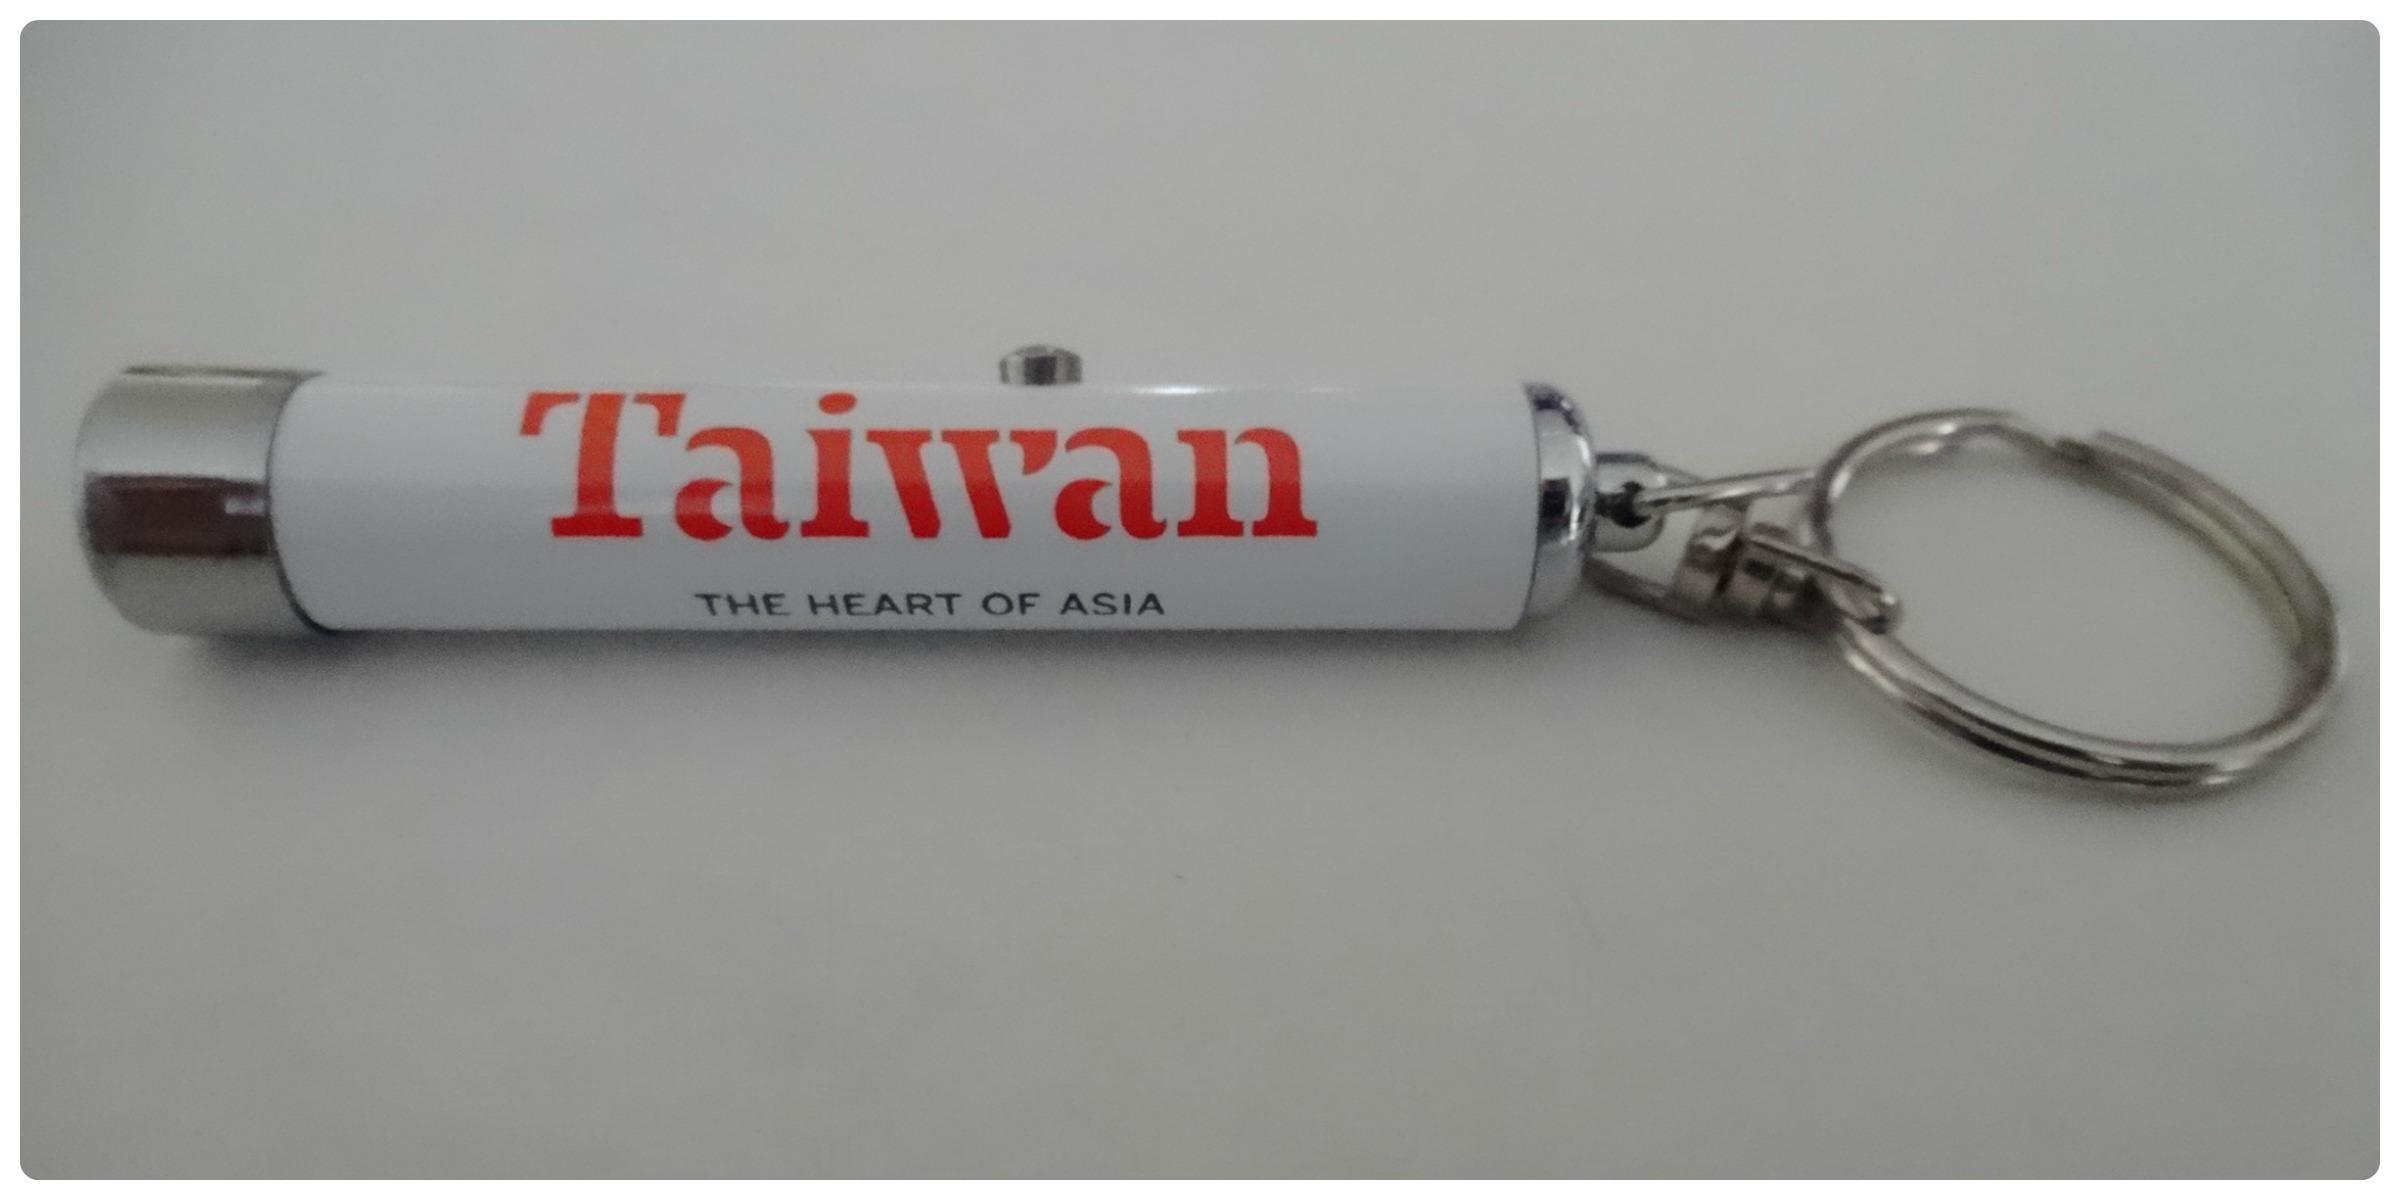 TaiwanCollage